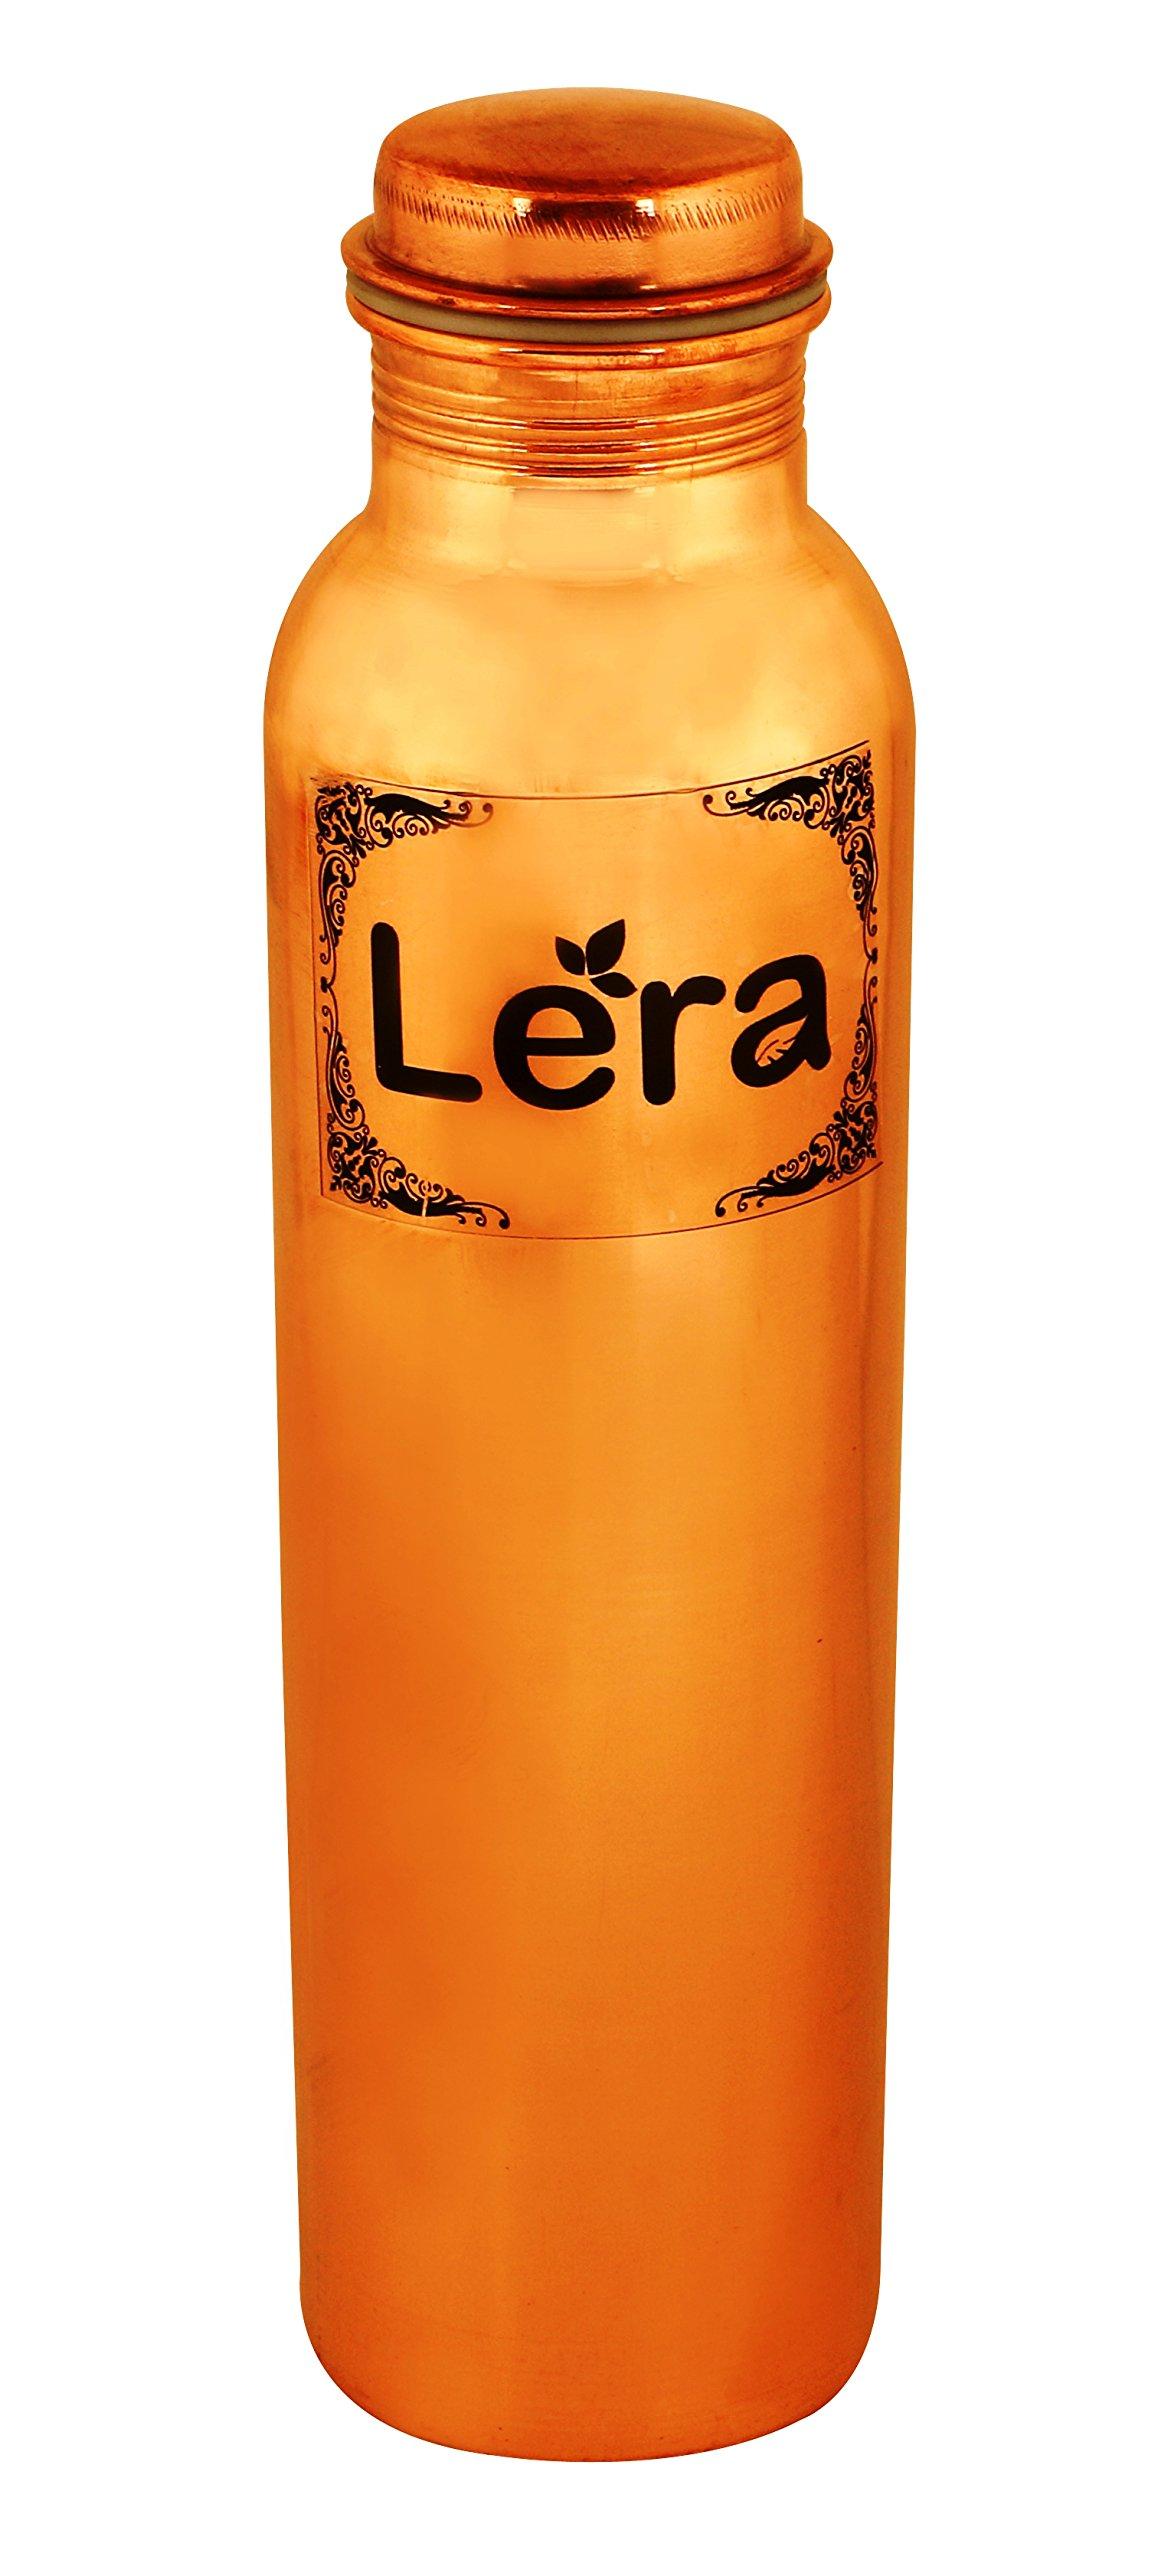 Lera 500Ml - Half Liter Pure Copper Bottle Leak Proof & Joint Free For Ayurvedic Health Benefits, Yoga & Travel Essential Drinkware – Made In India Tamba Bottle (Tamara Jal) By Lera